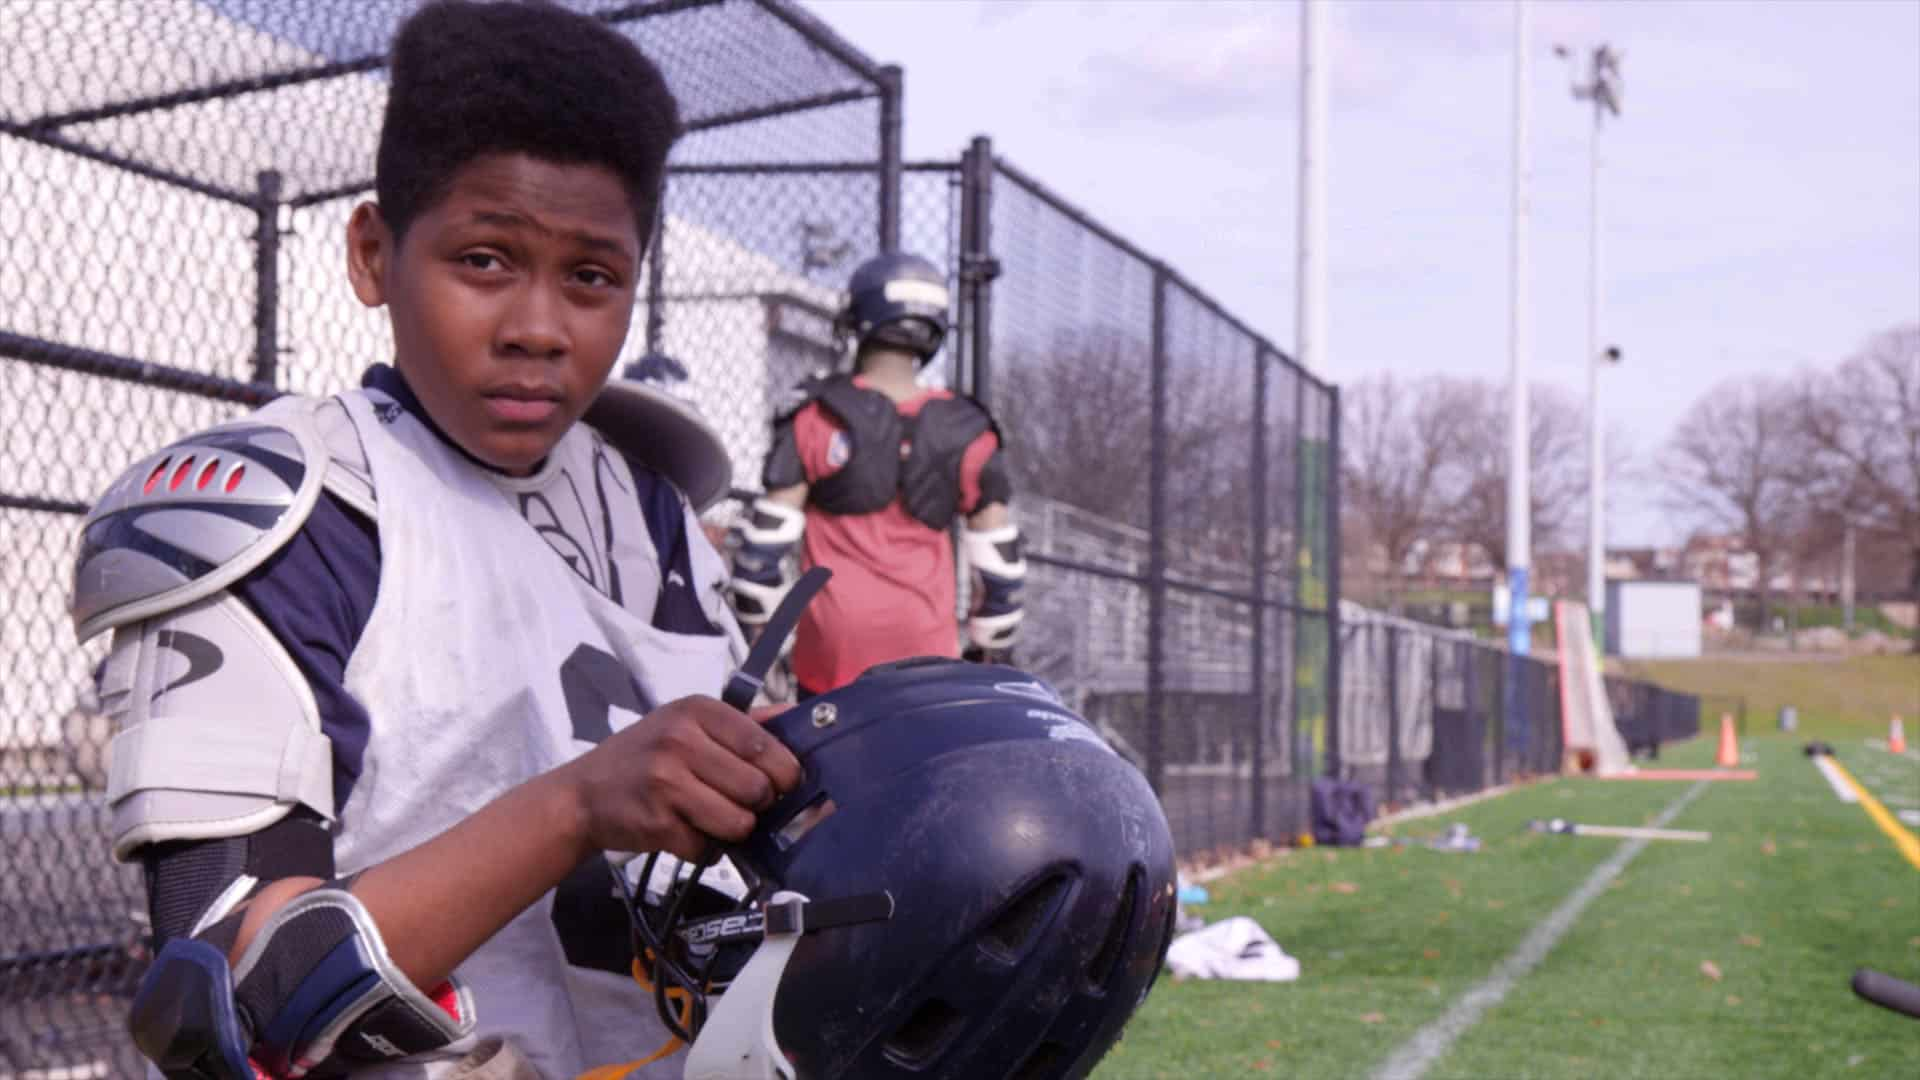 Harlem Lacrosse - Baltimore